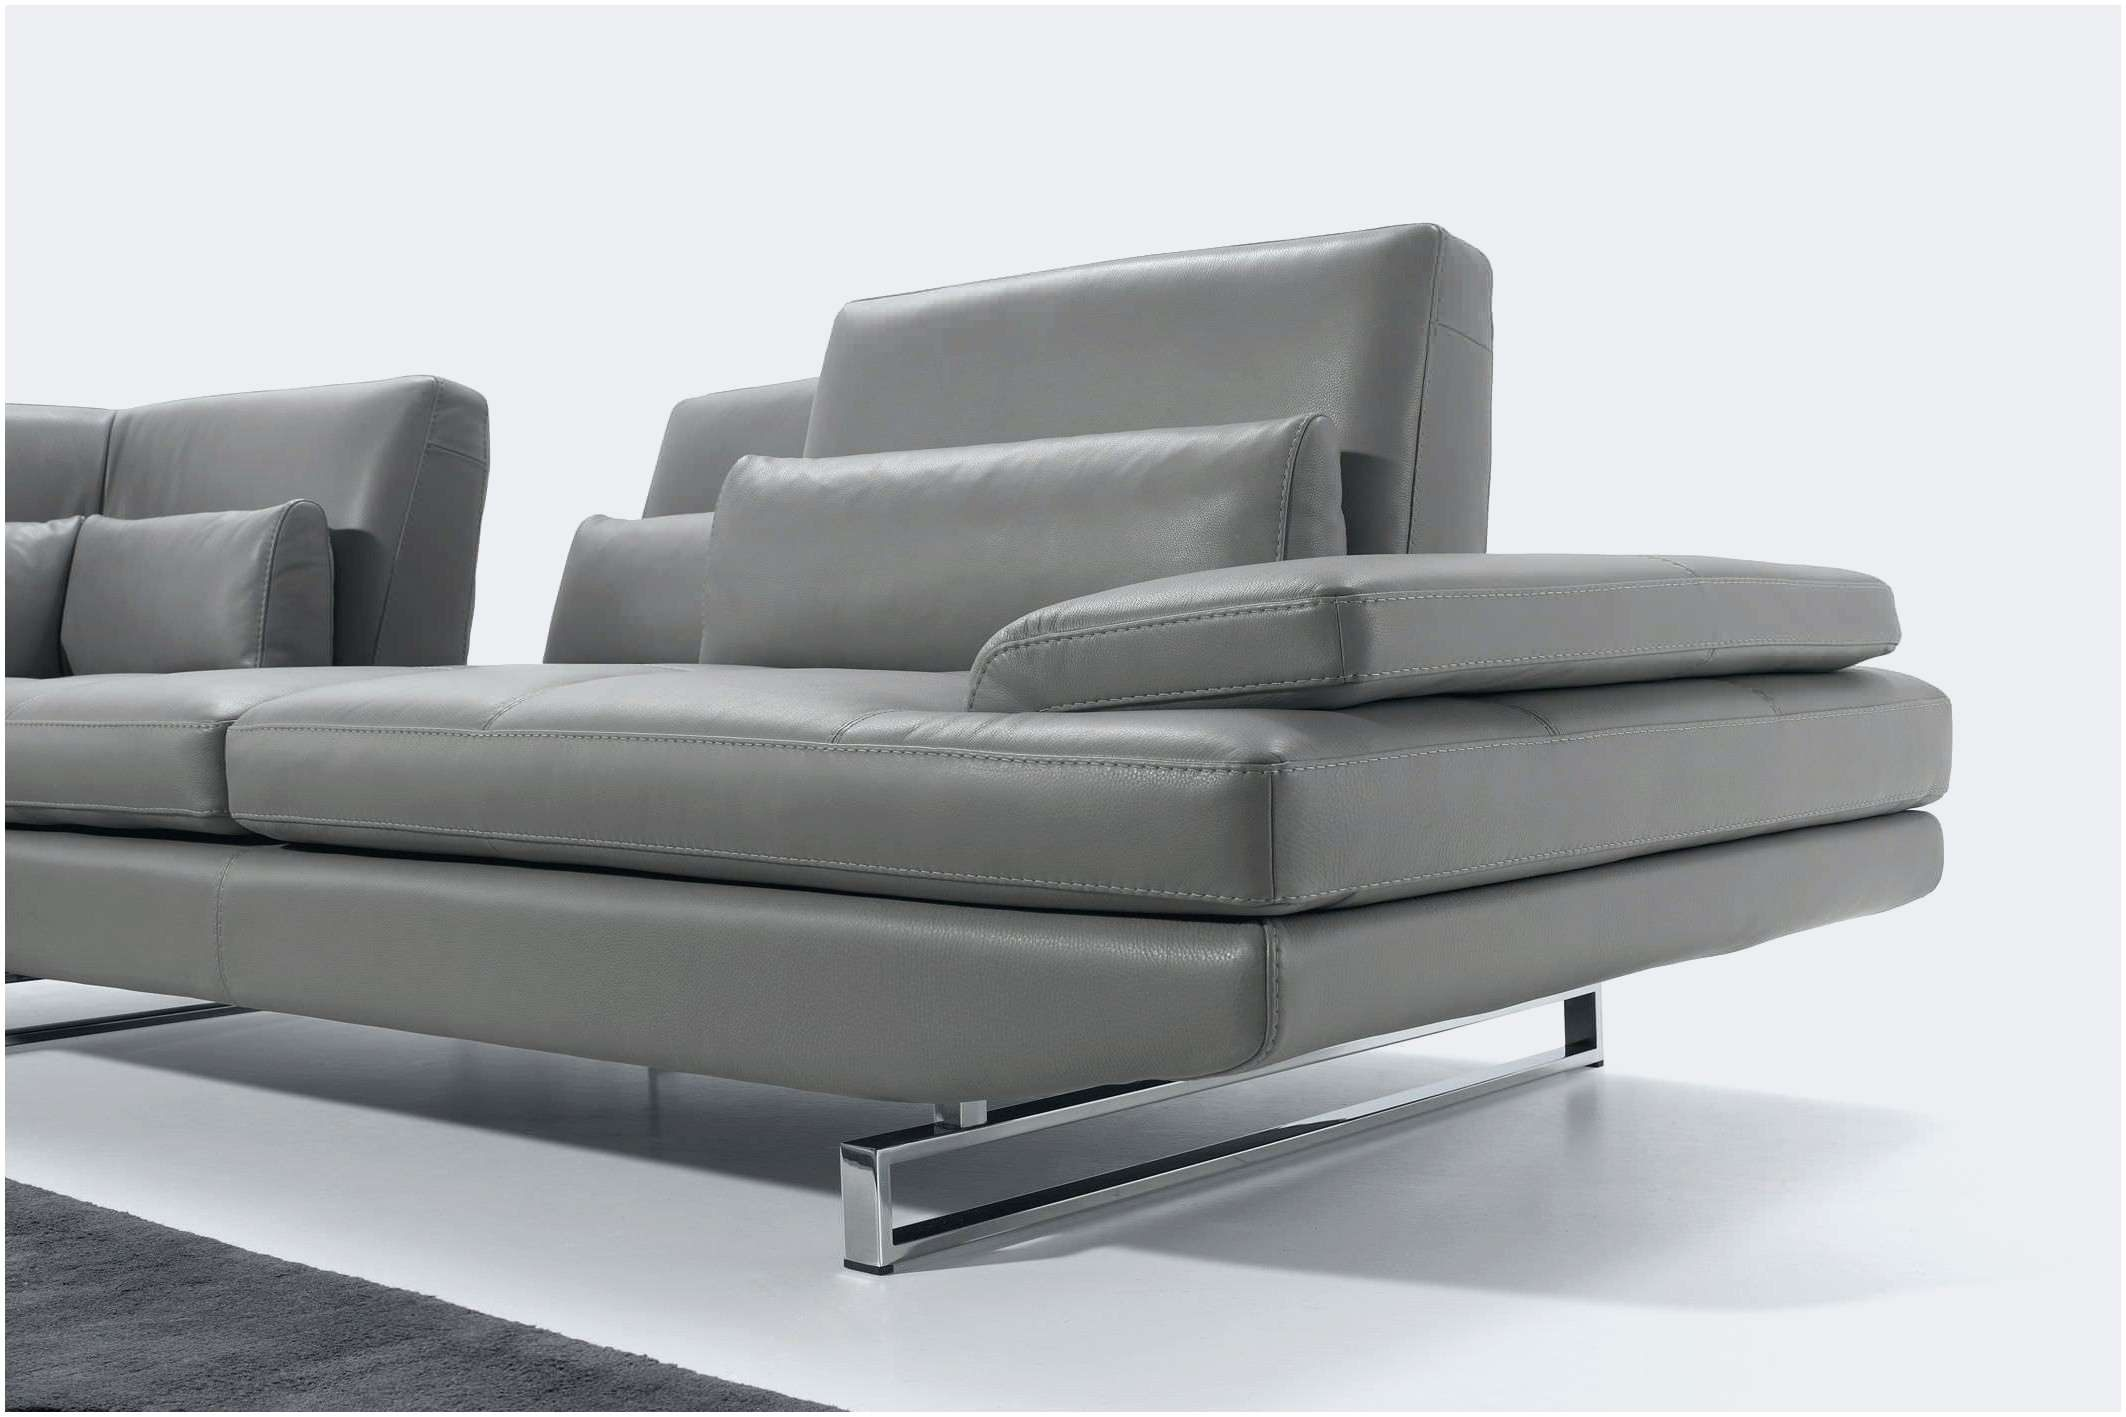 lit superpos angle l gant jongor4hire page 101 of 2056. Black Bedroom Furniture Sets. Home Design Ideas